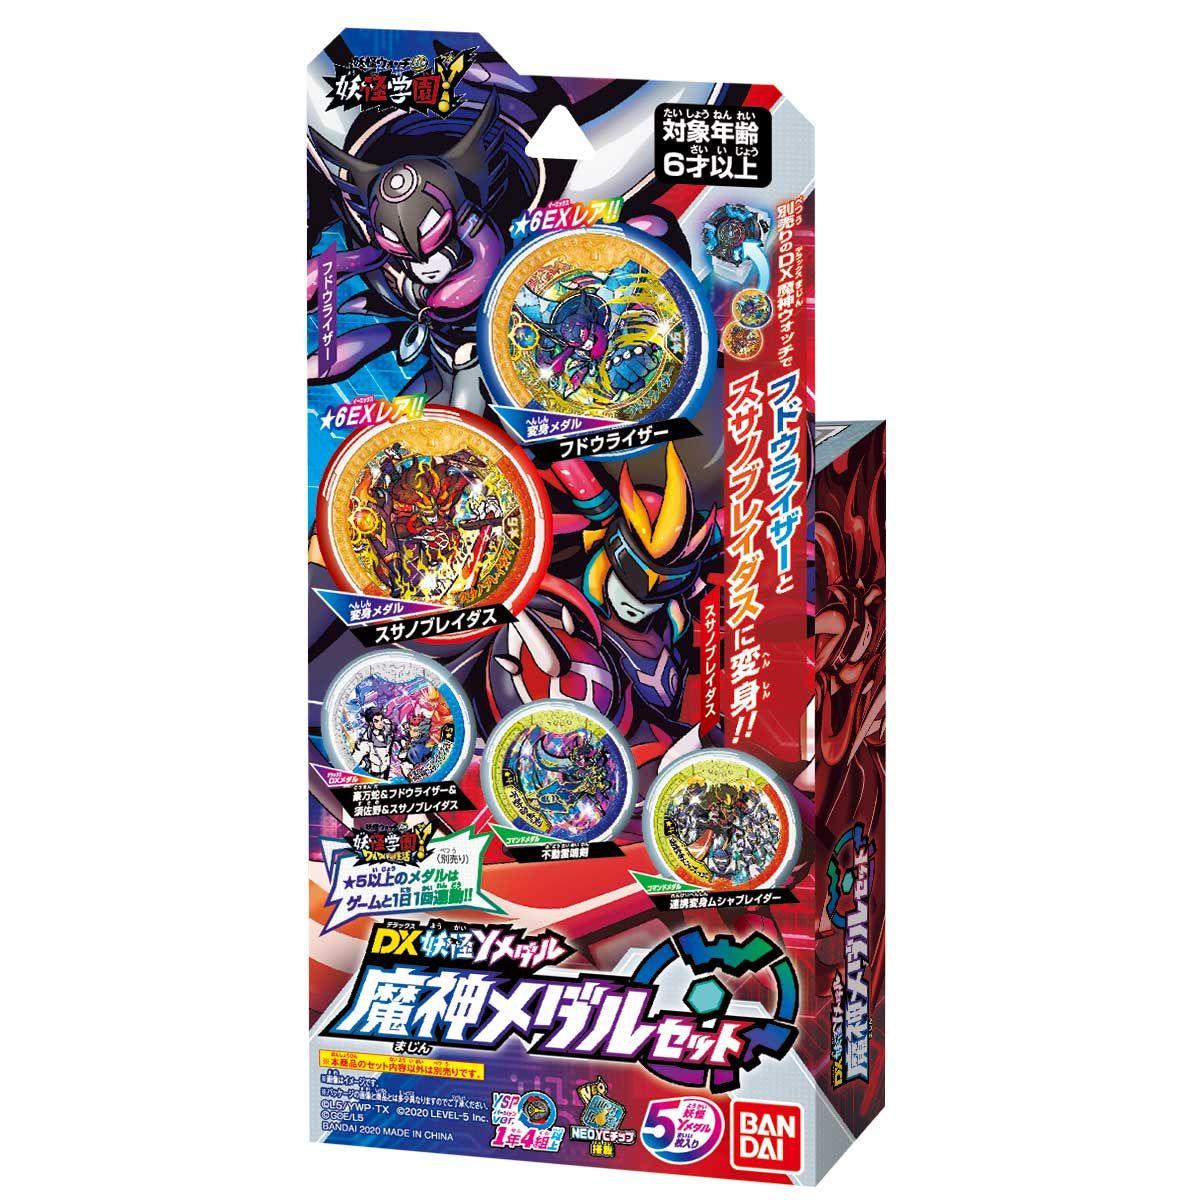 DX妖怪Yメダル 魔神メダルセット